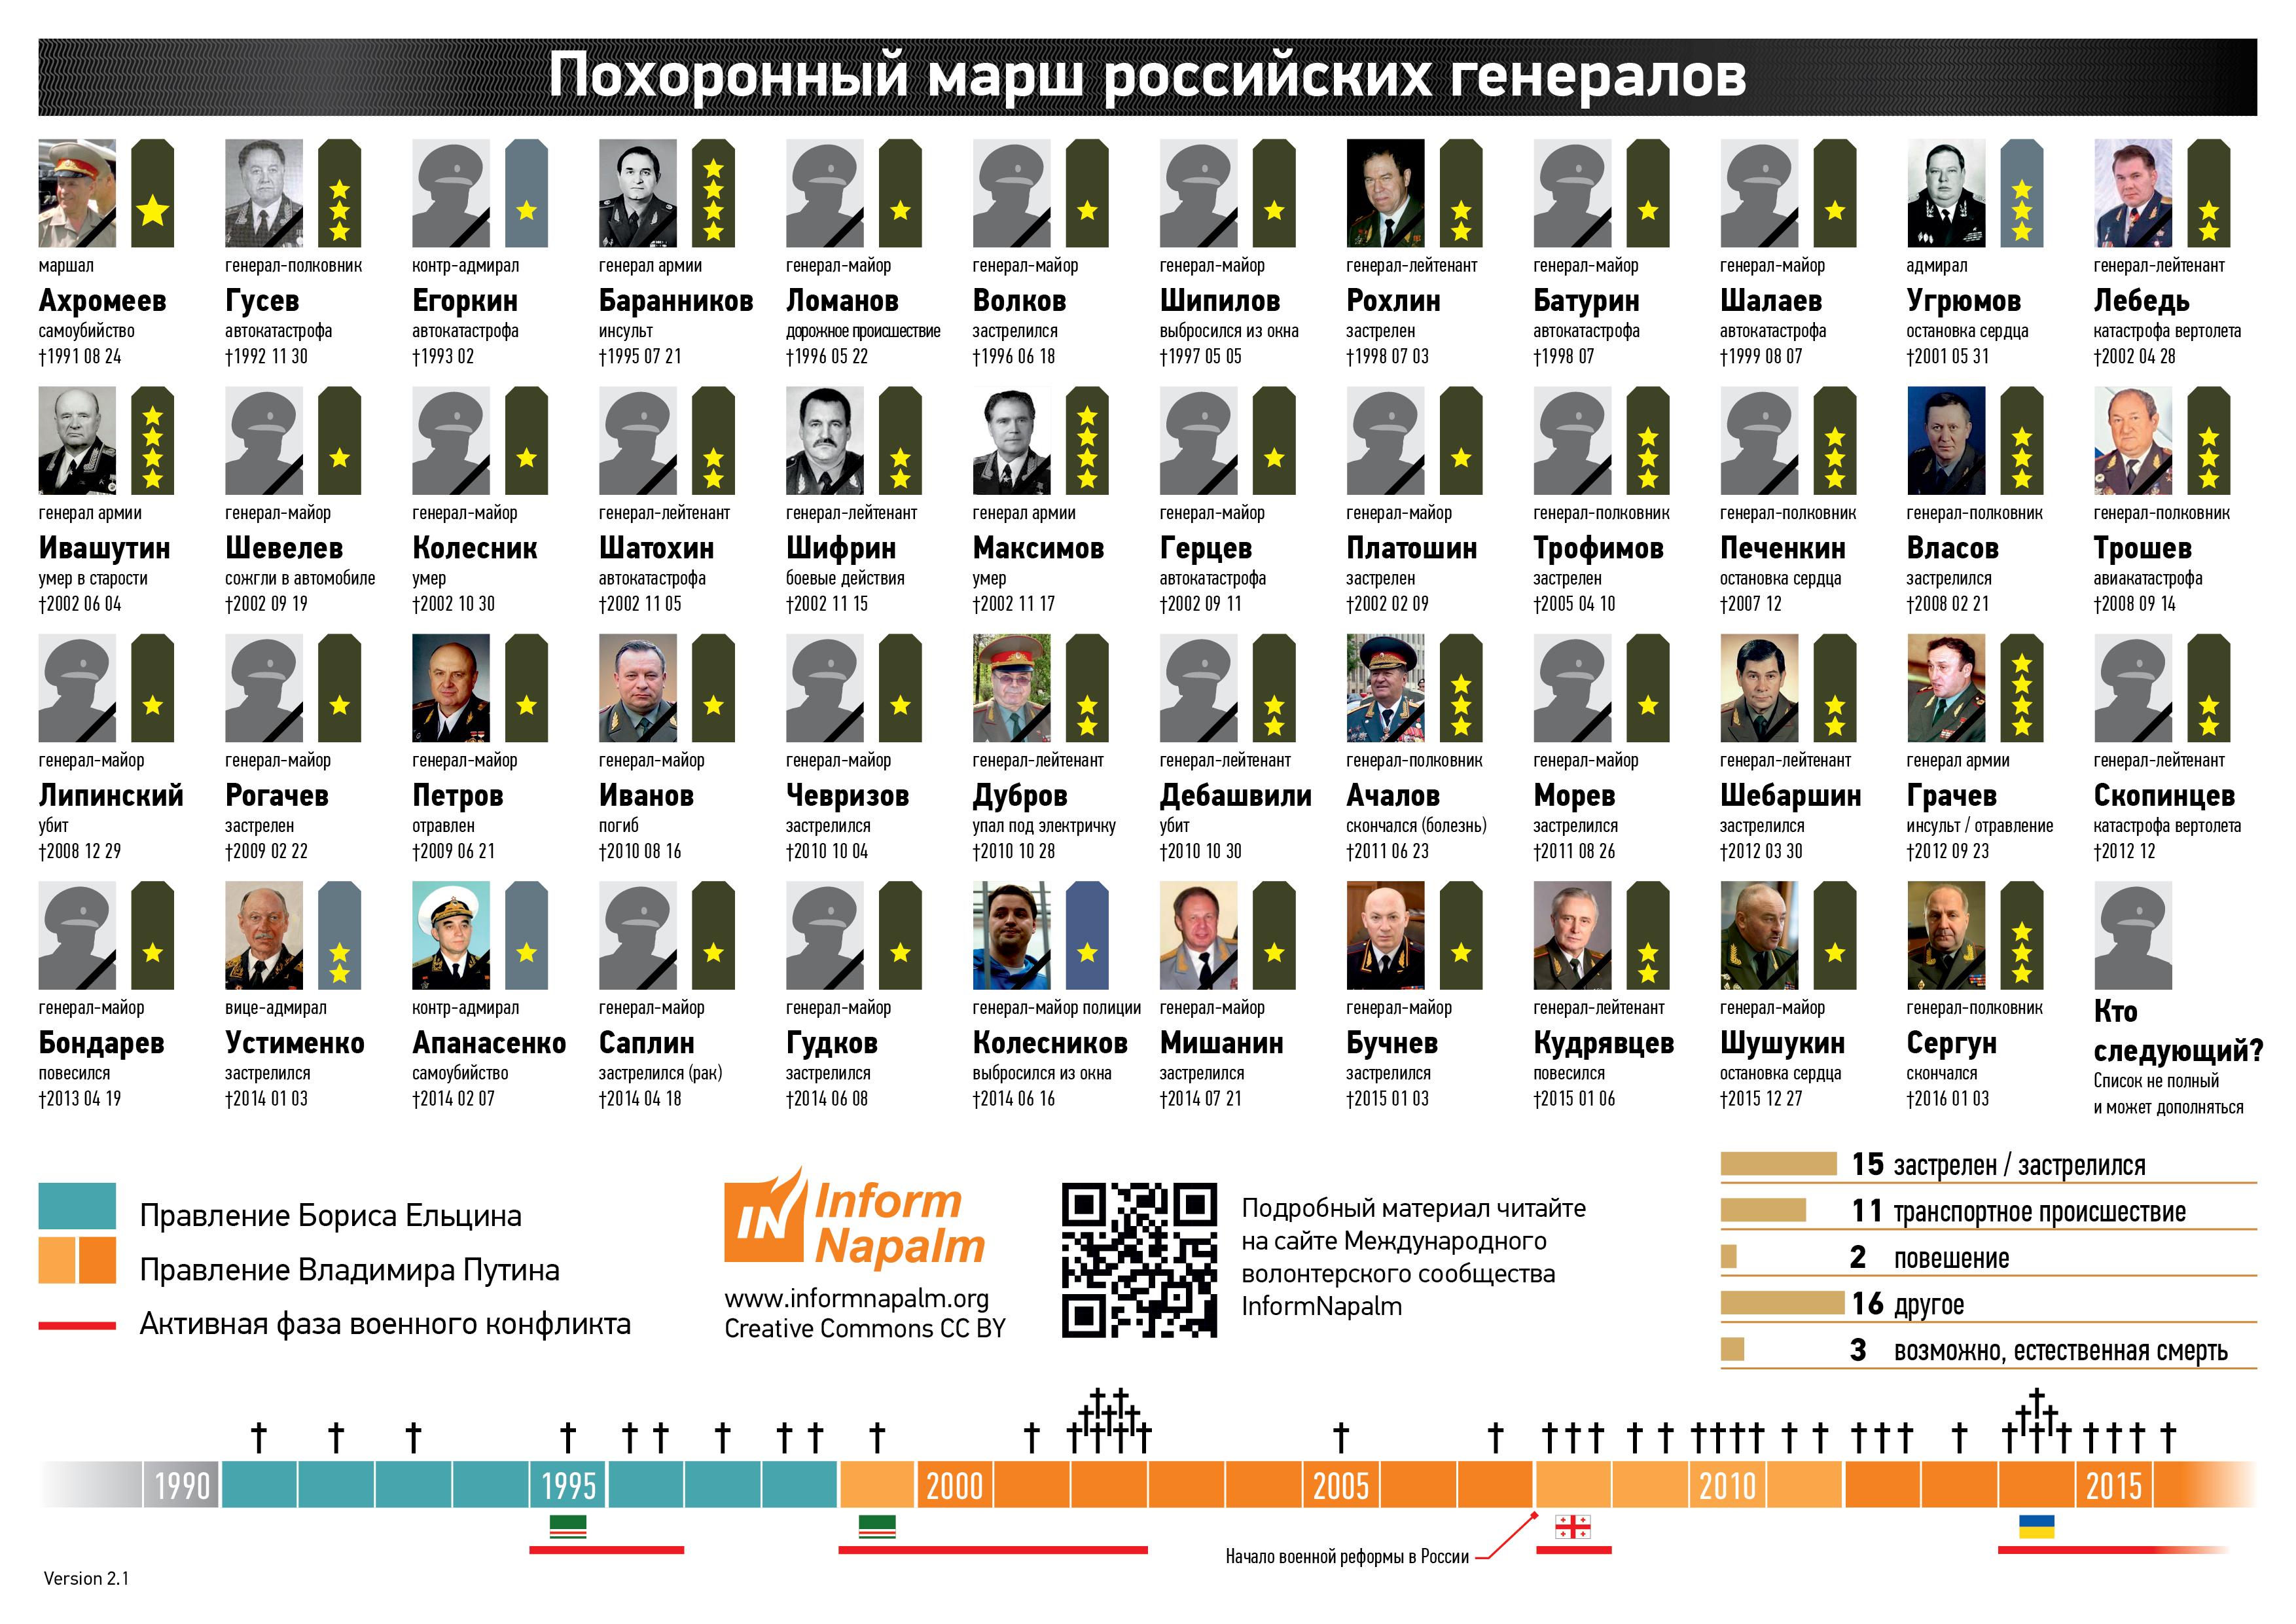 Суд разрешил заочно судить командующего Черноморским Флотом РФ Александра Витко - Цензор.НЕТ 96